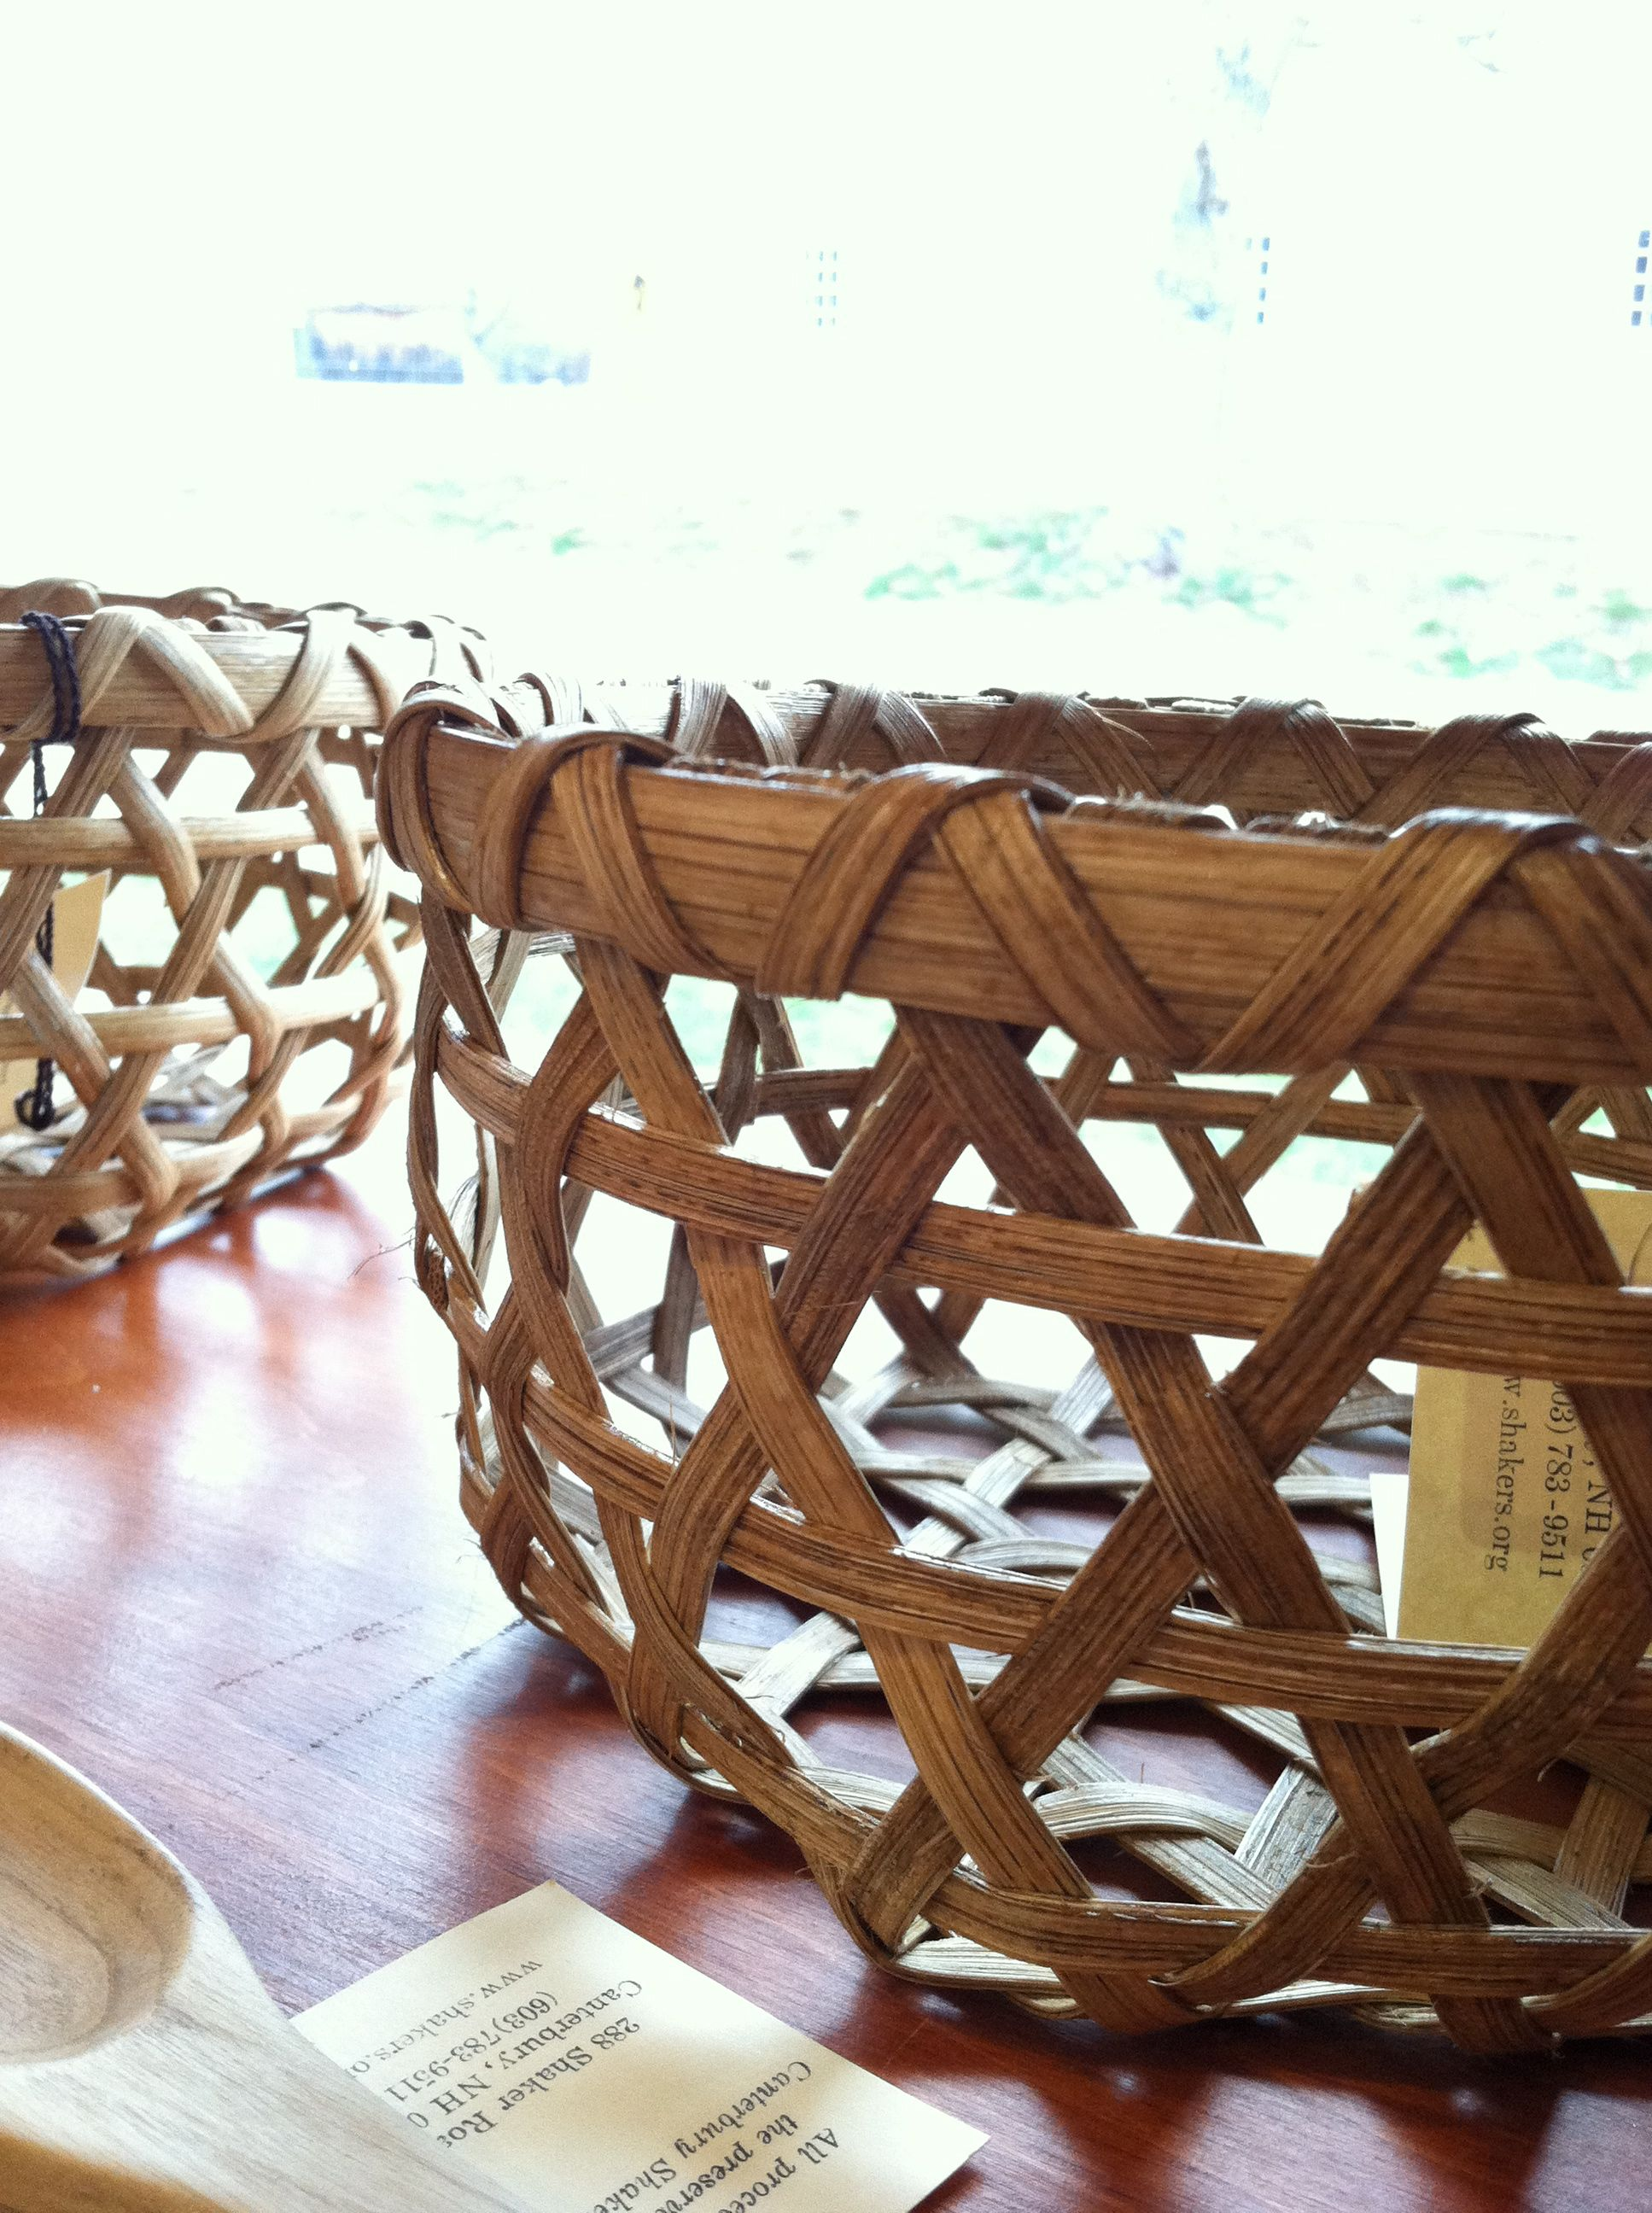 Handmade baskets at Canterbury Shaker Village. Handmade